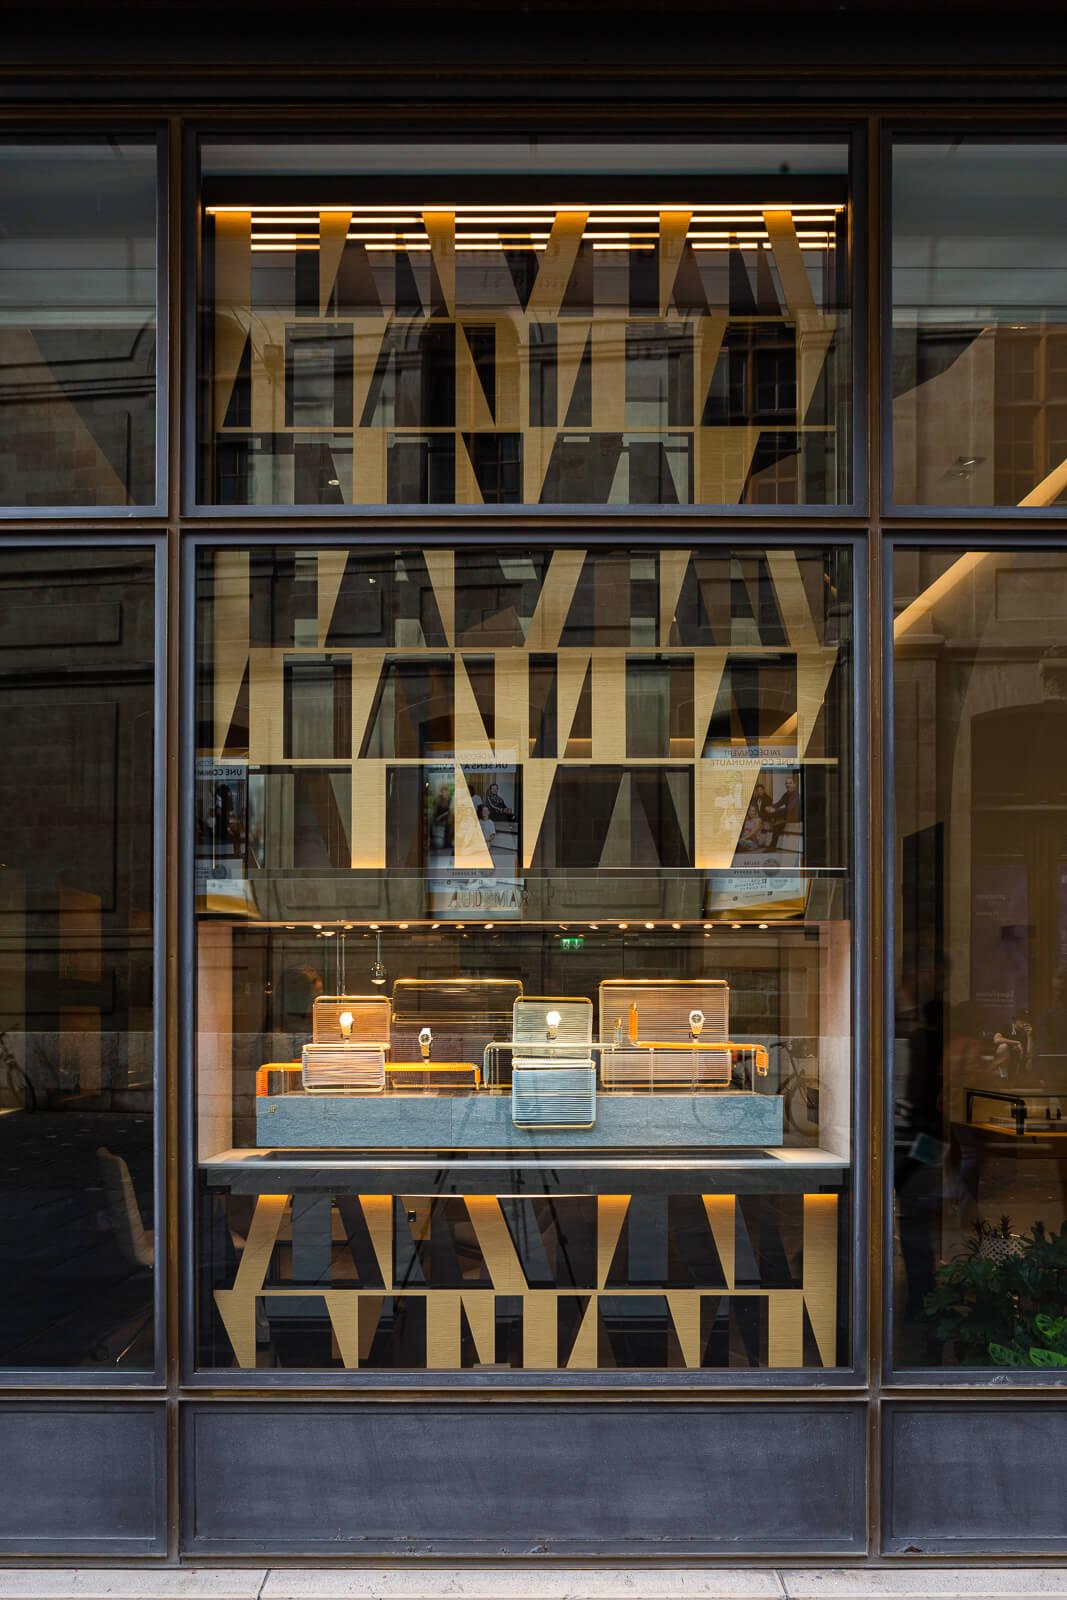 audemars-piguet-window-display-6